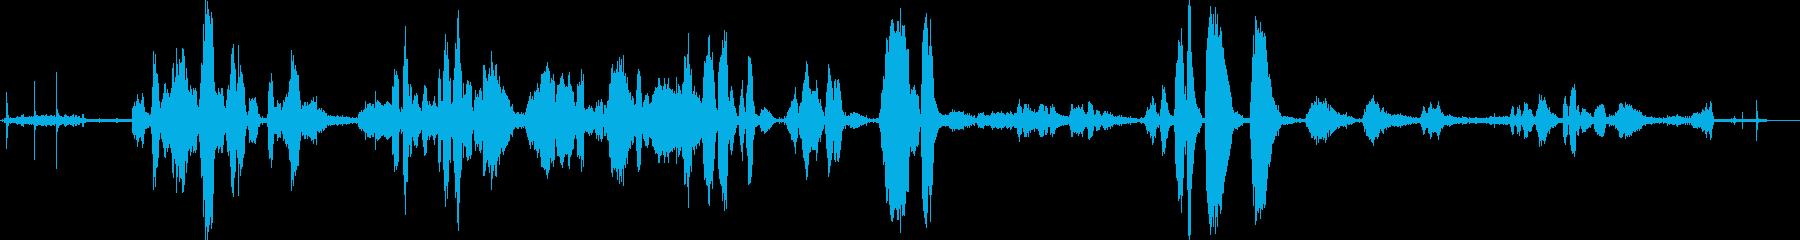 Victrola;クリックして、ス...の再生済みの波形